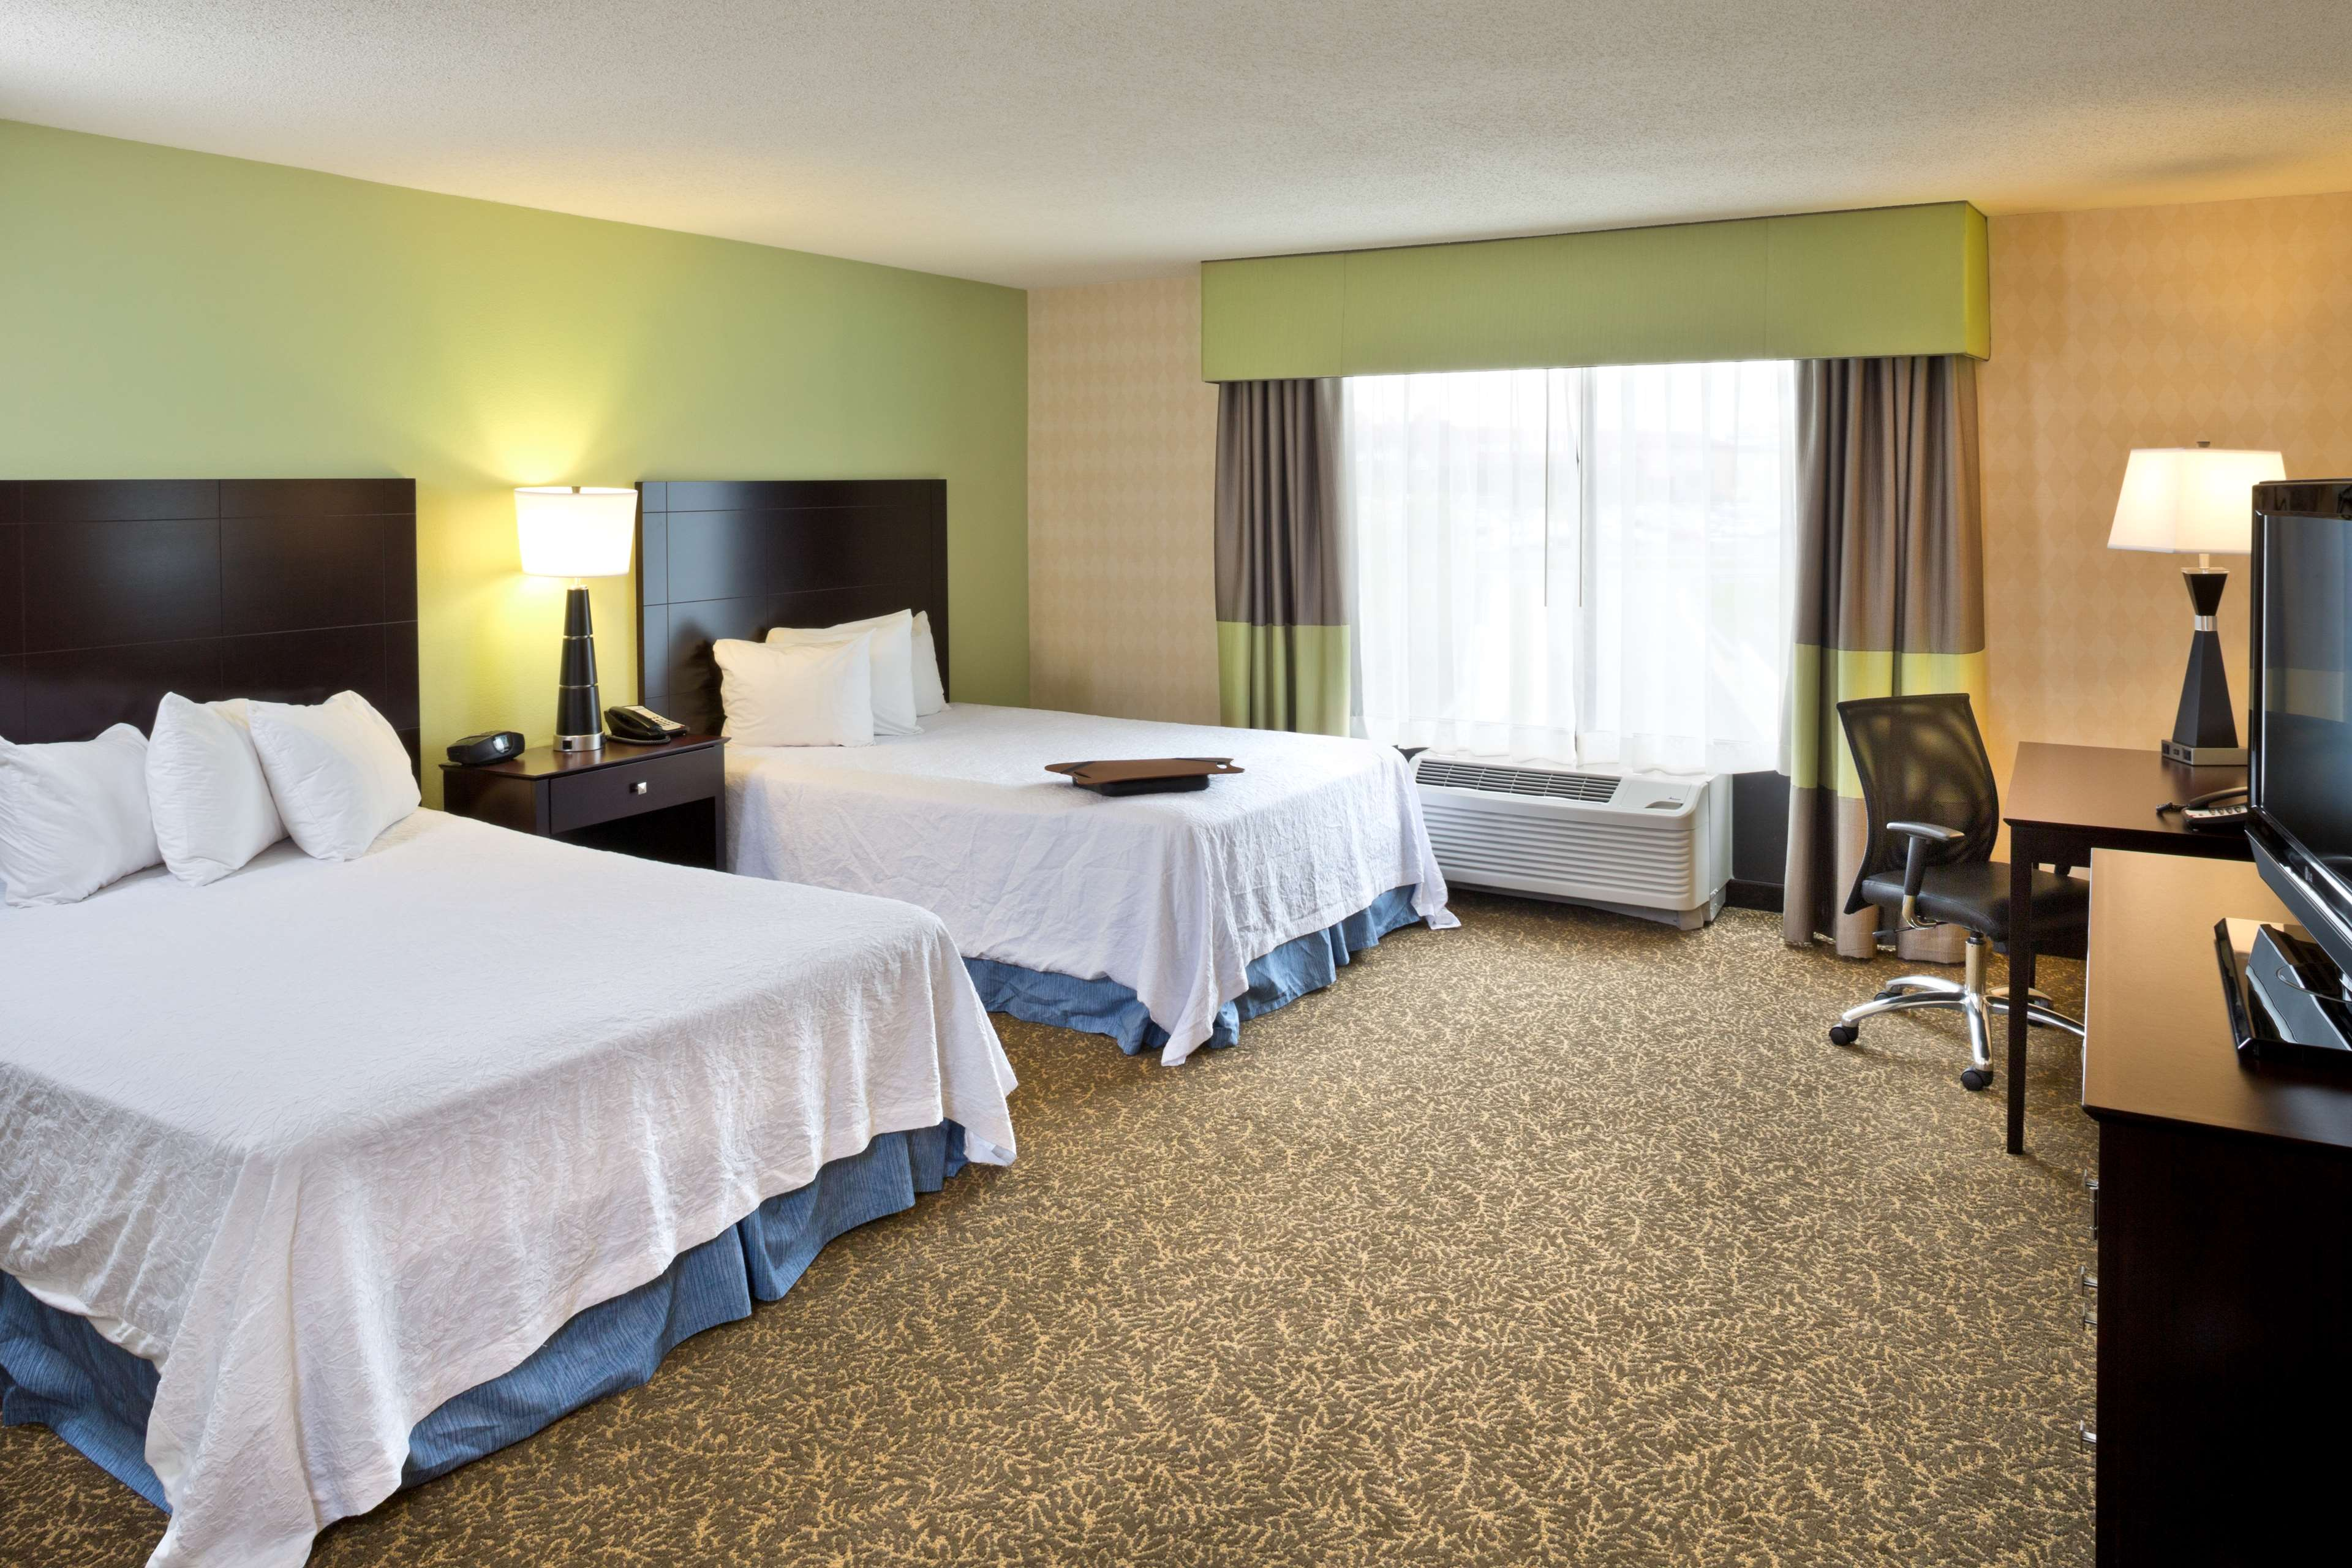 Hampton Inn & Suites Arundel Mills/Baltimore image 13